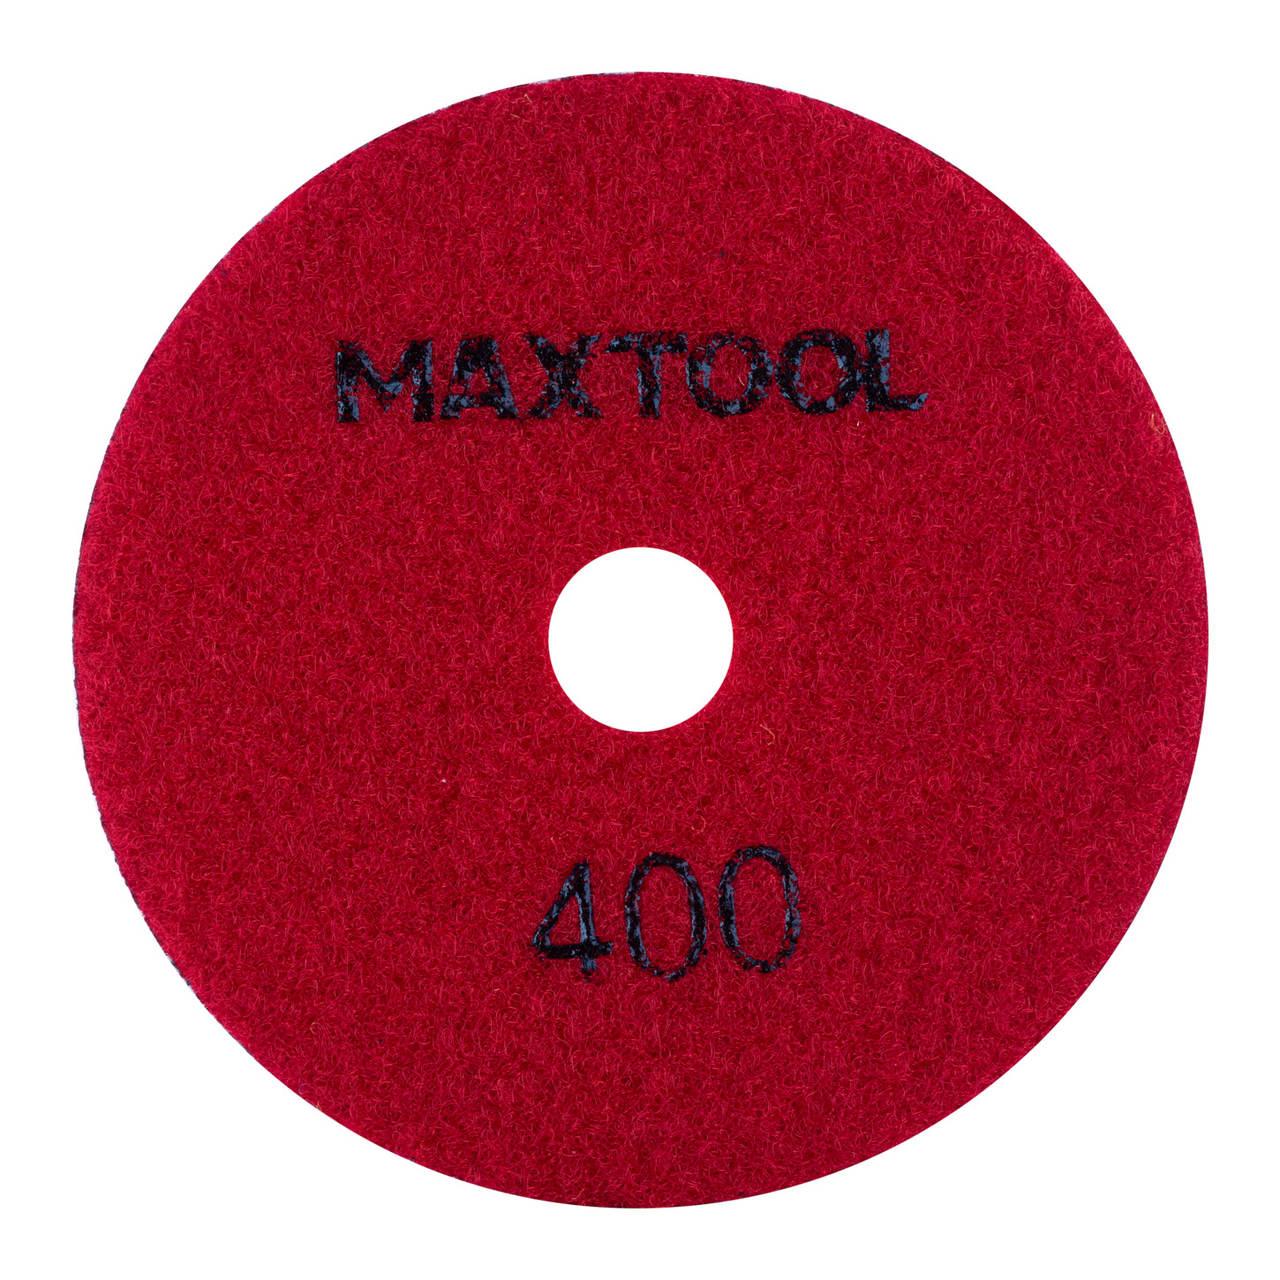 Lixa diamantada d'agua colmeia Maxtool 100mm